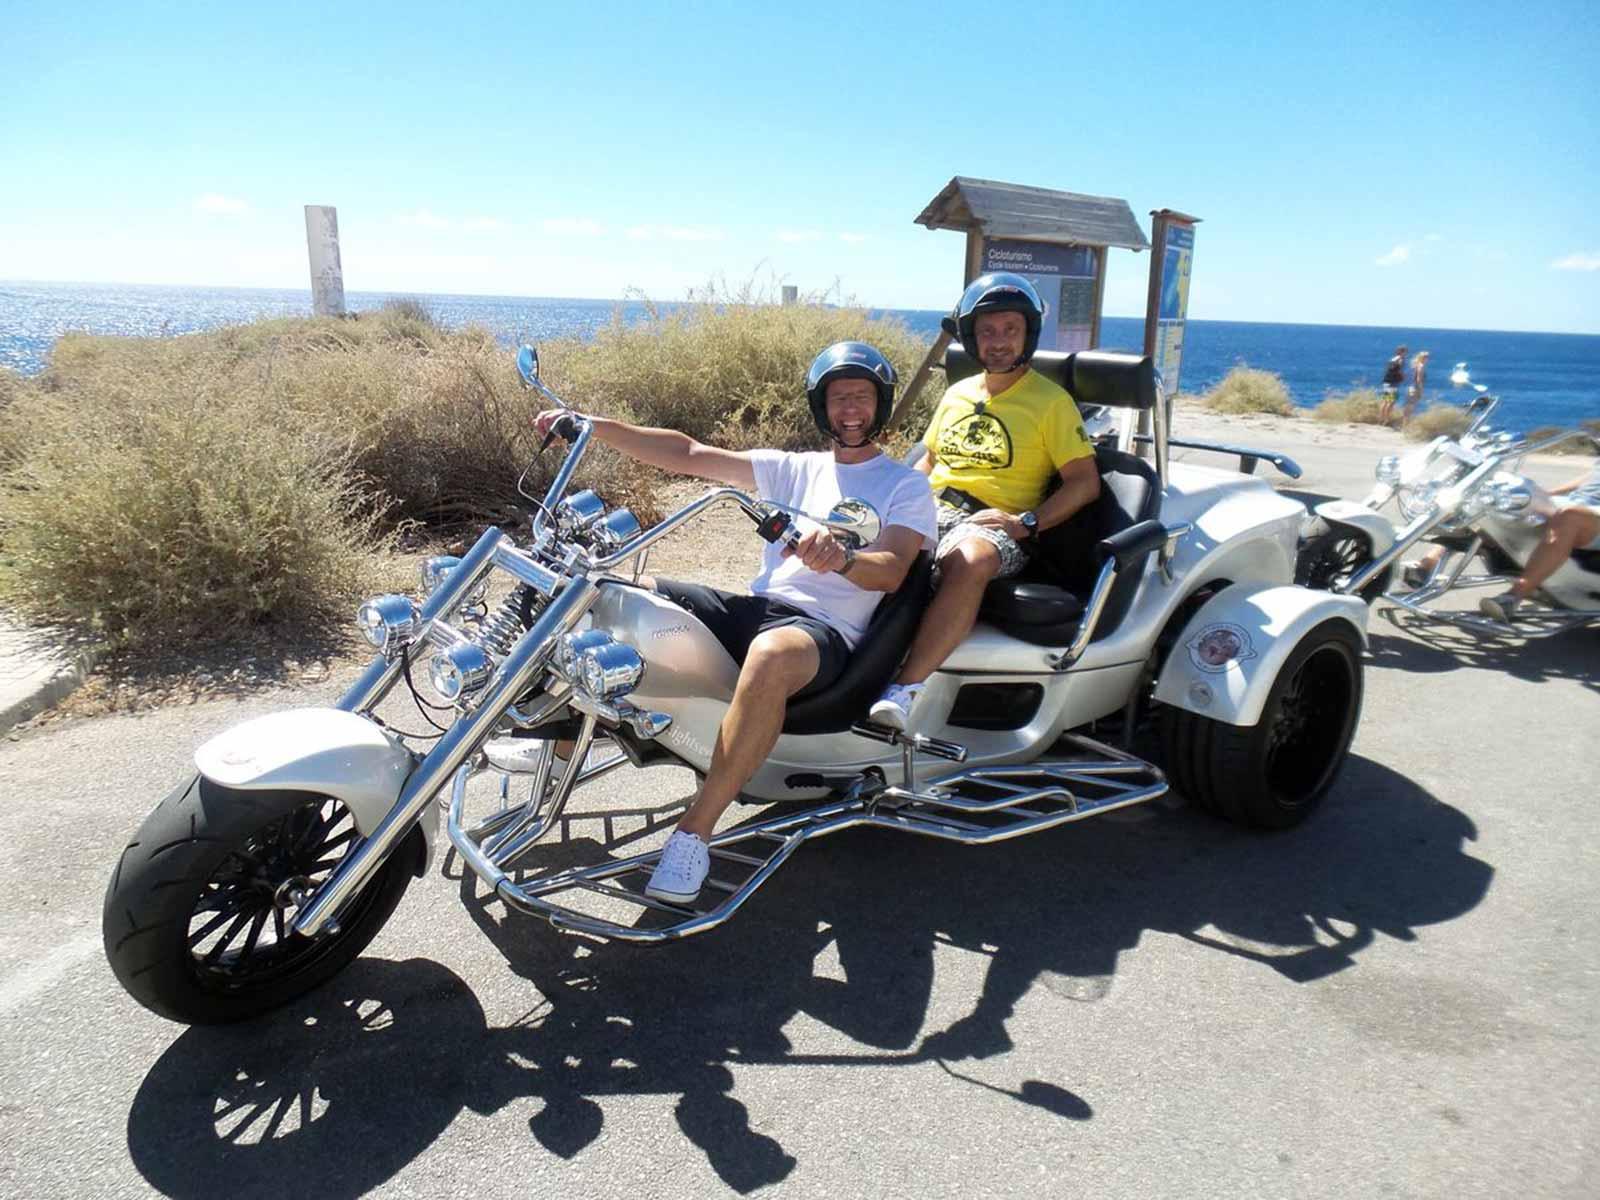 Trike-Mallorca-Trike-Tour-Mallorca-9